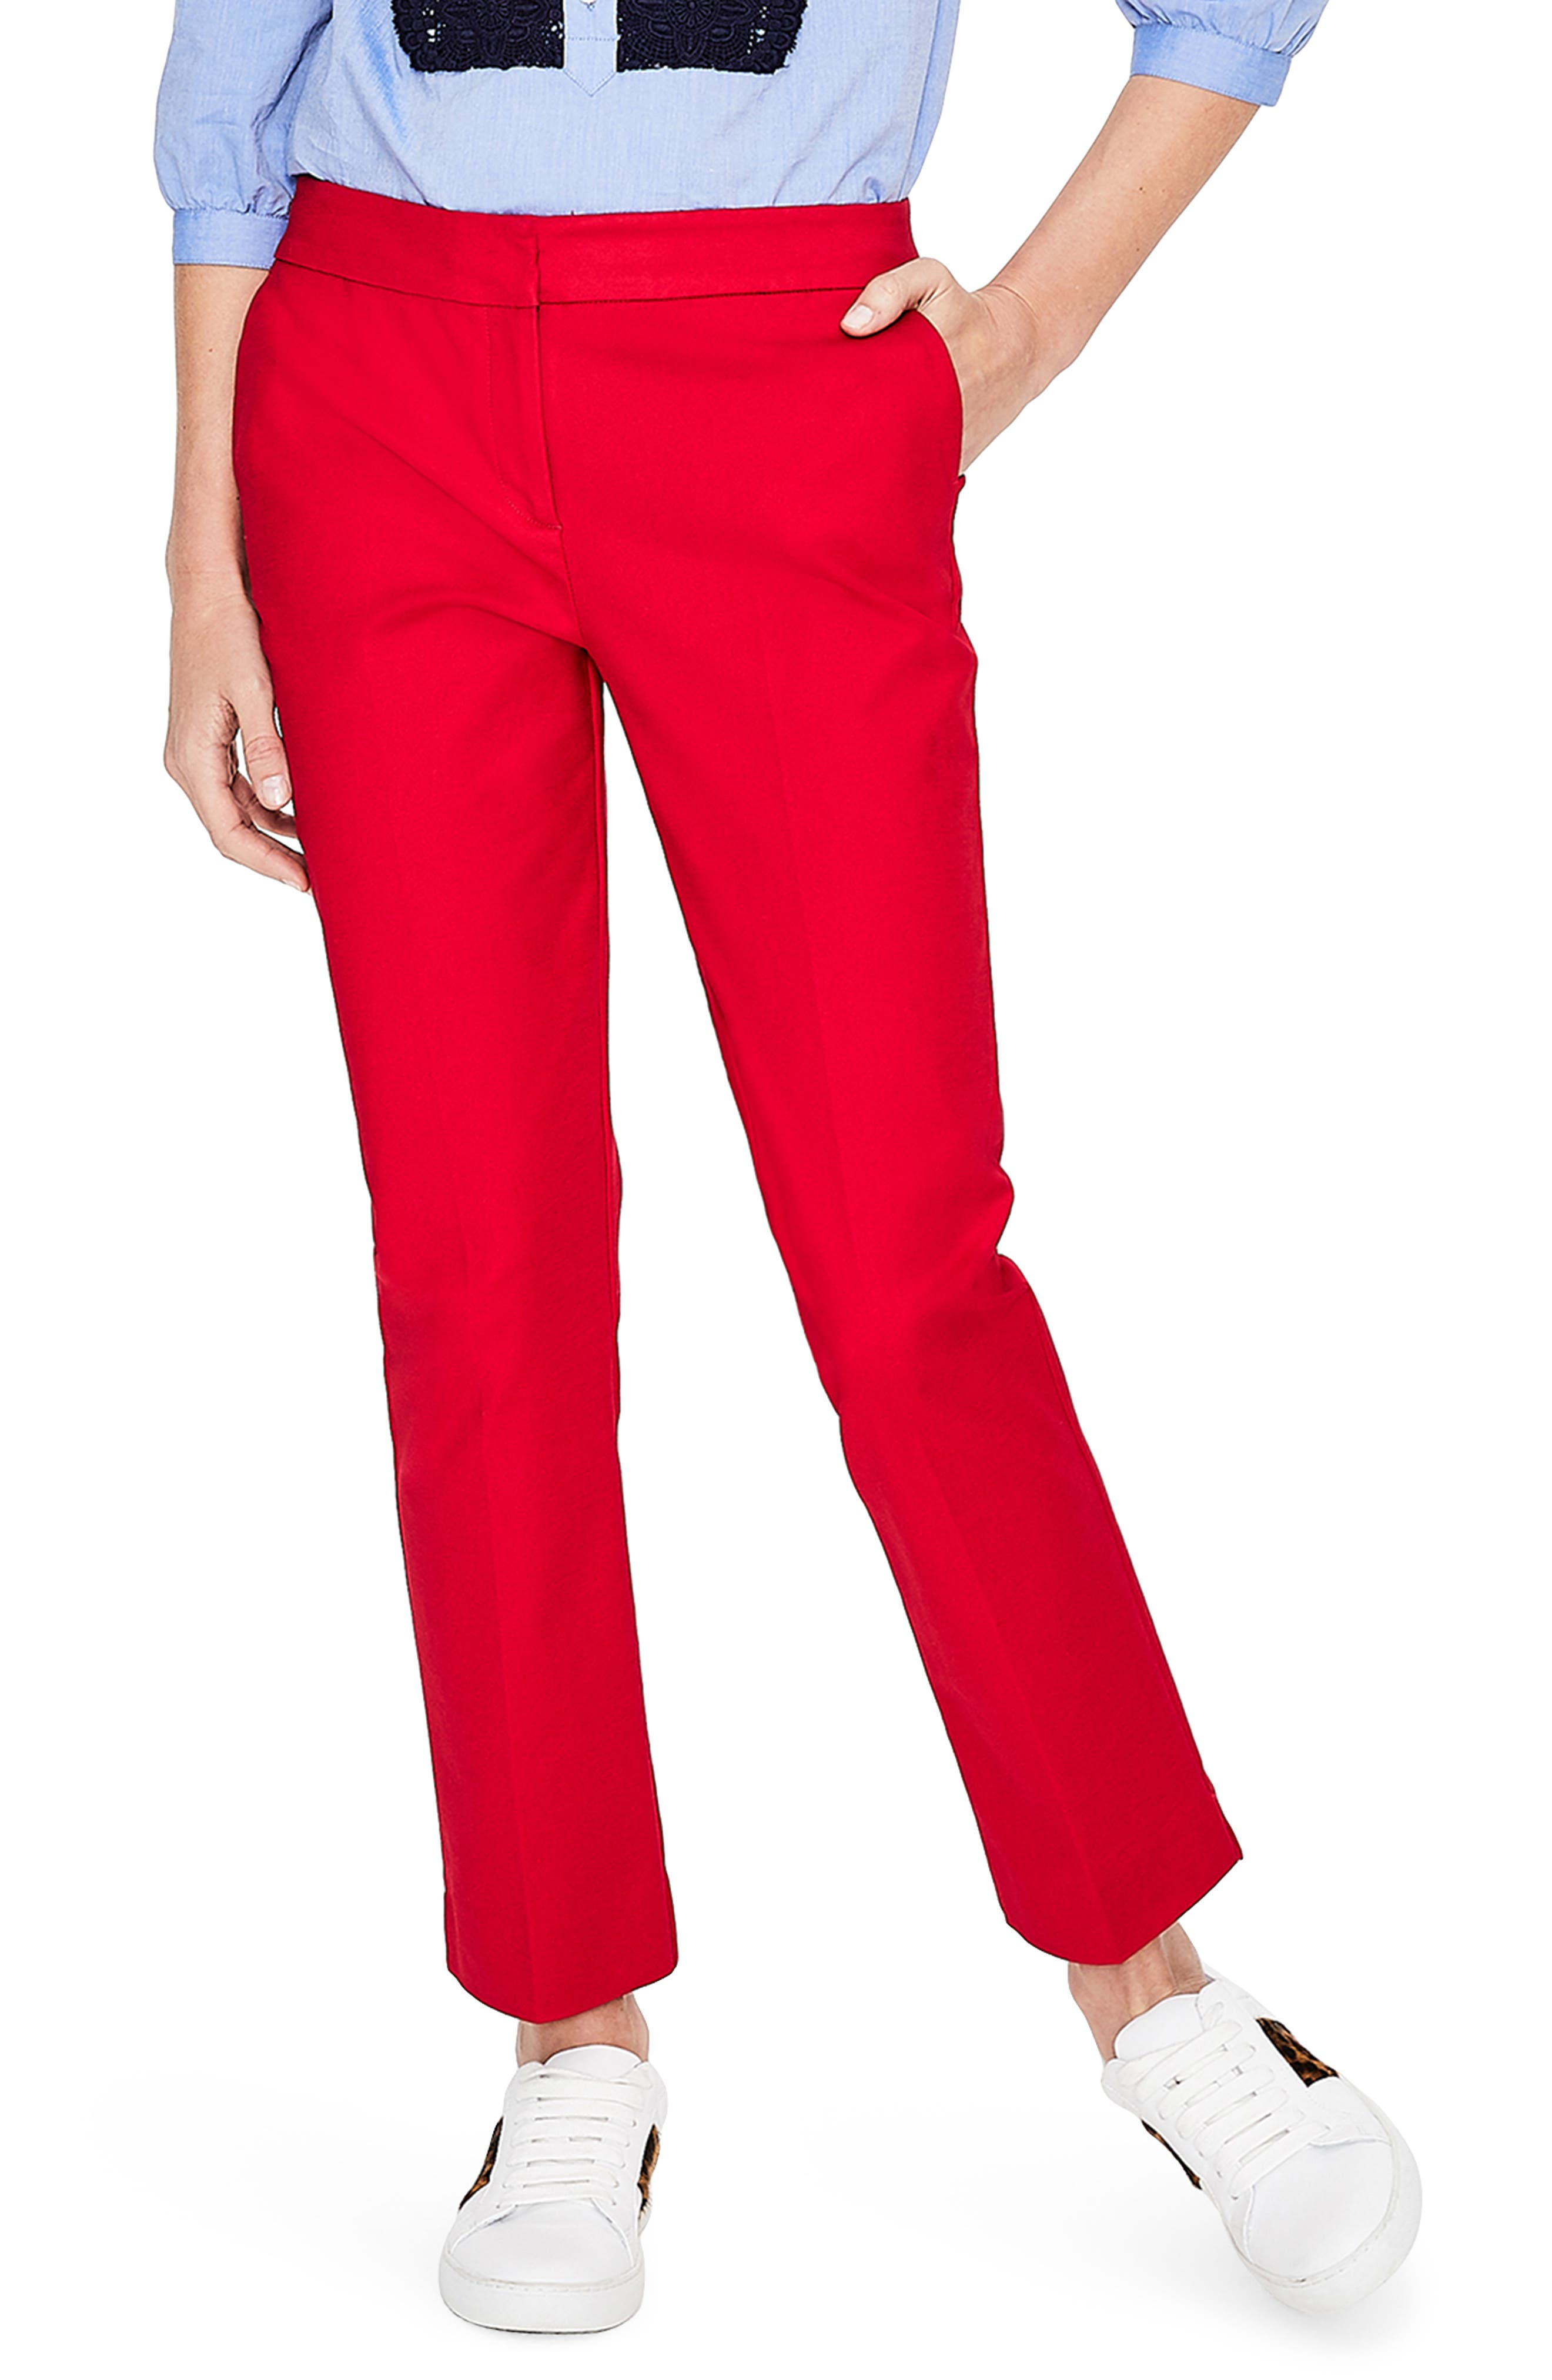 Richmond Polka Dot Stripe Contrast Ankle Pants,                         Main,                         color, POINSETTIA